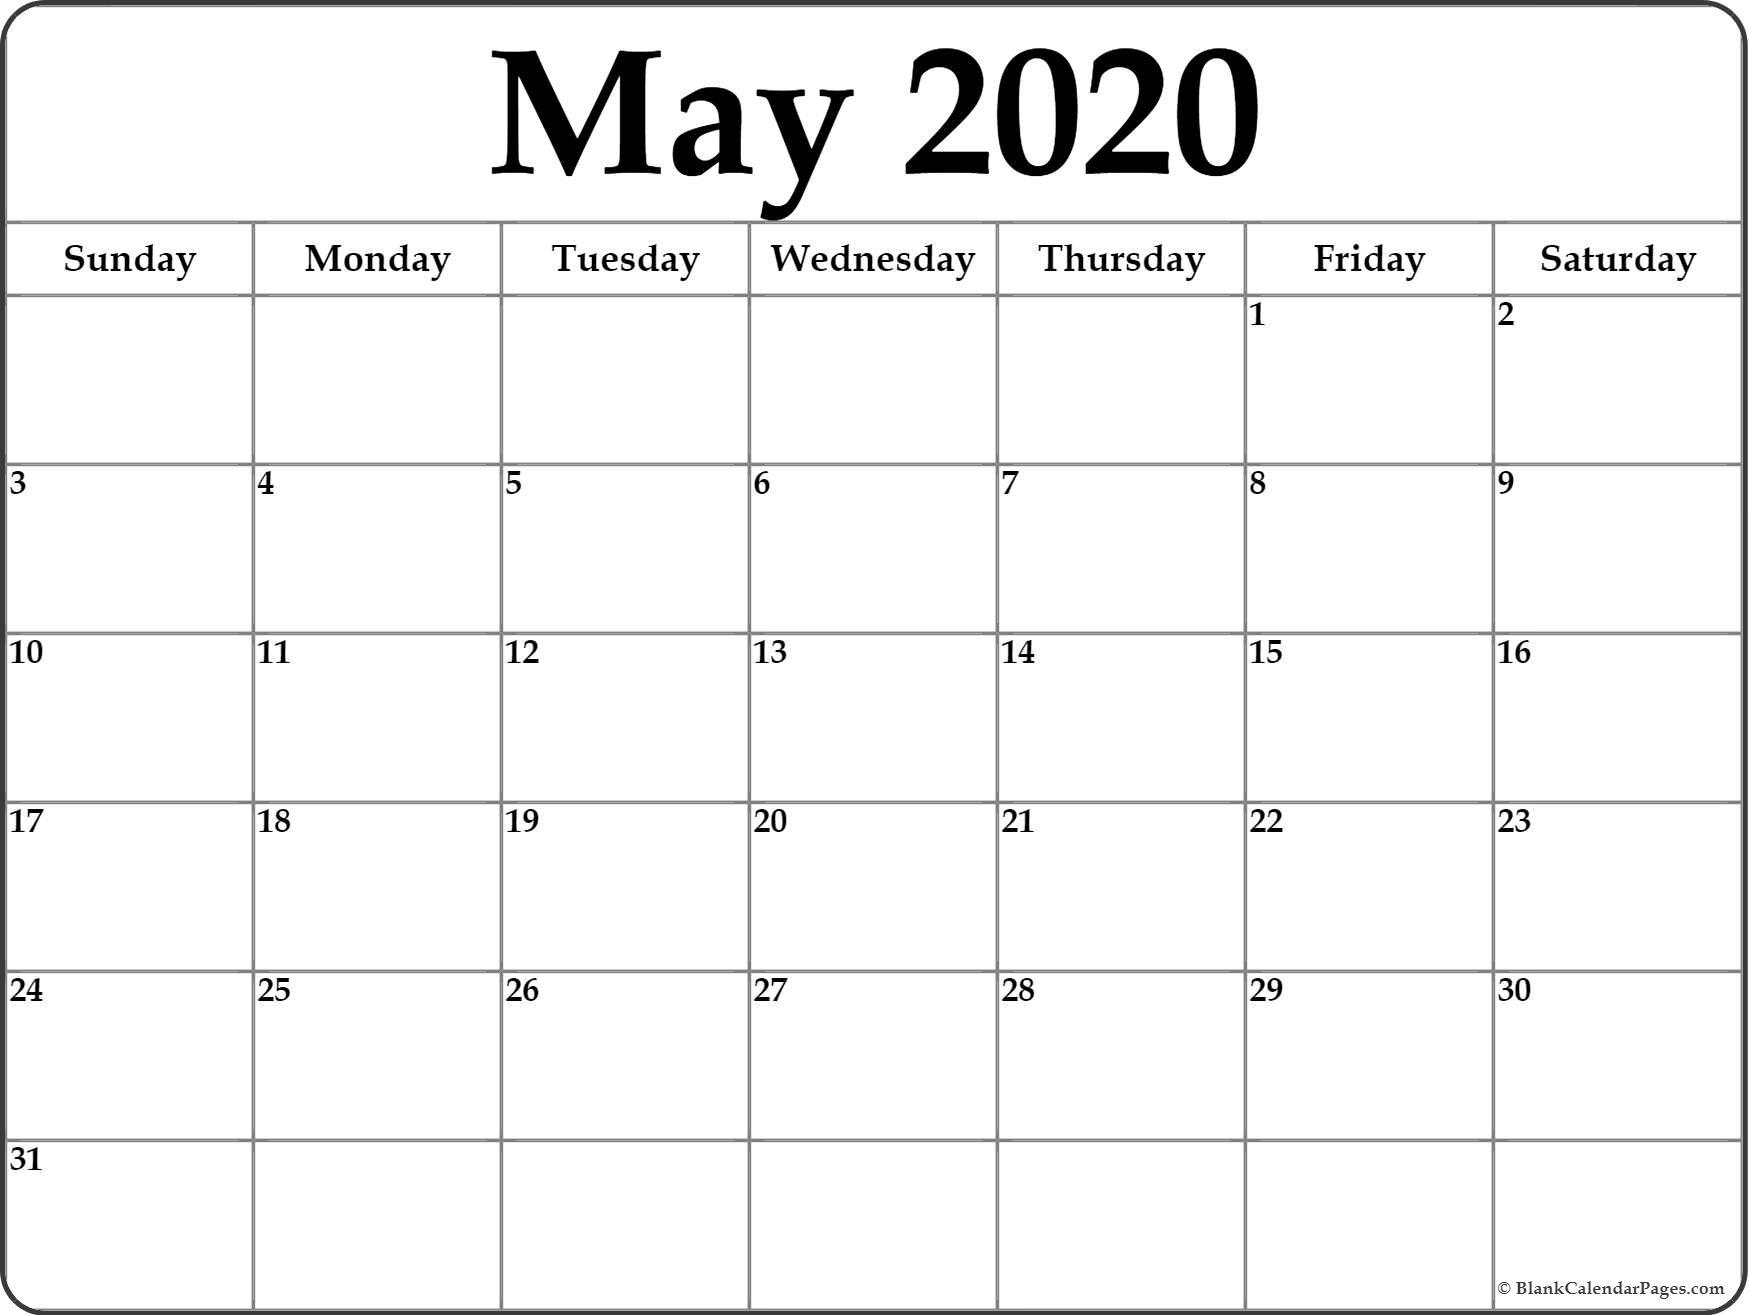 May 2020 Calendar | Free Printable Monthly Calendars throughout Free Blank Printable Monthly Calendar 2020